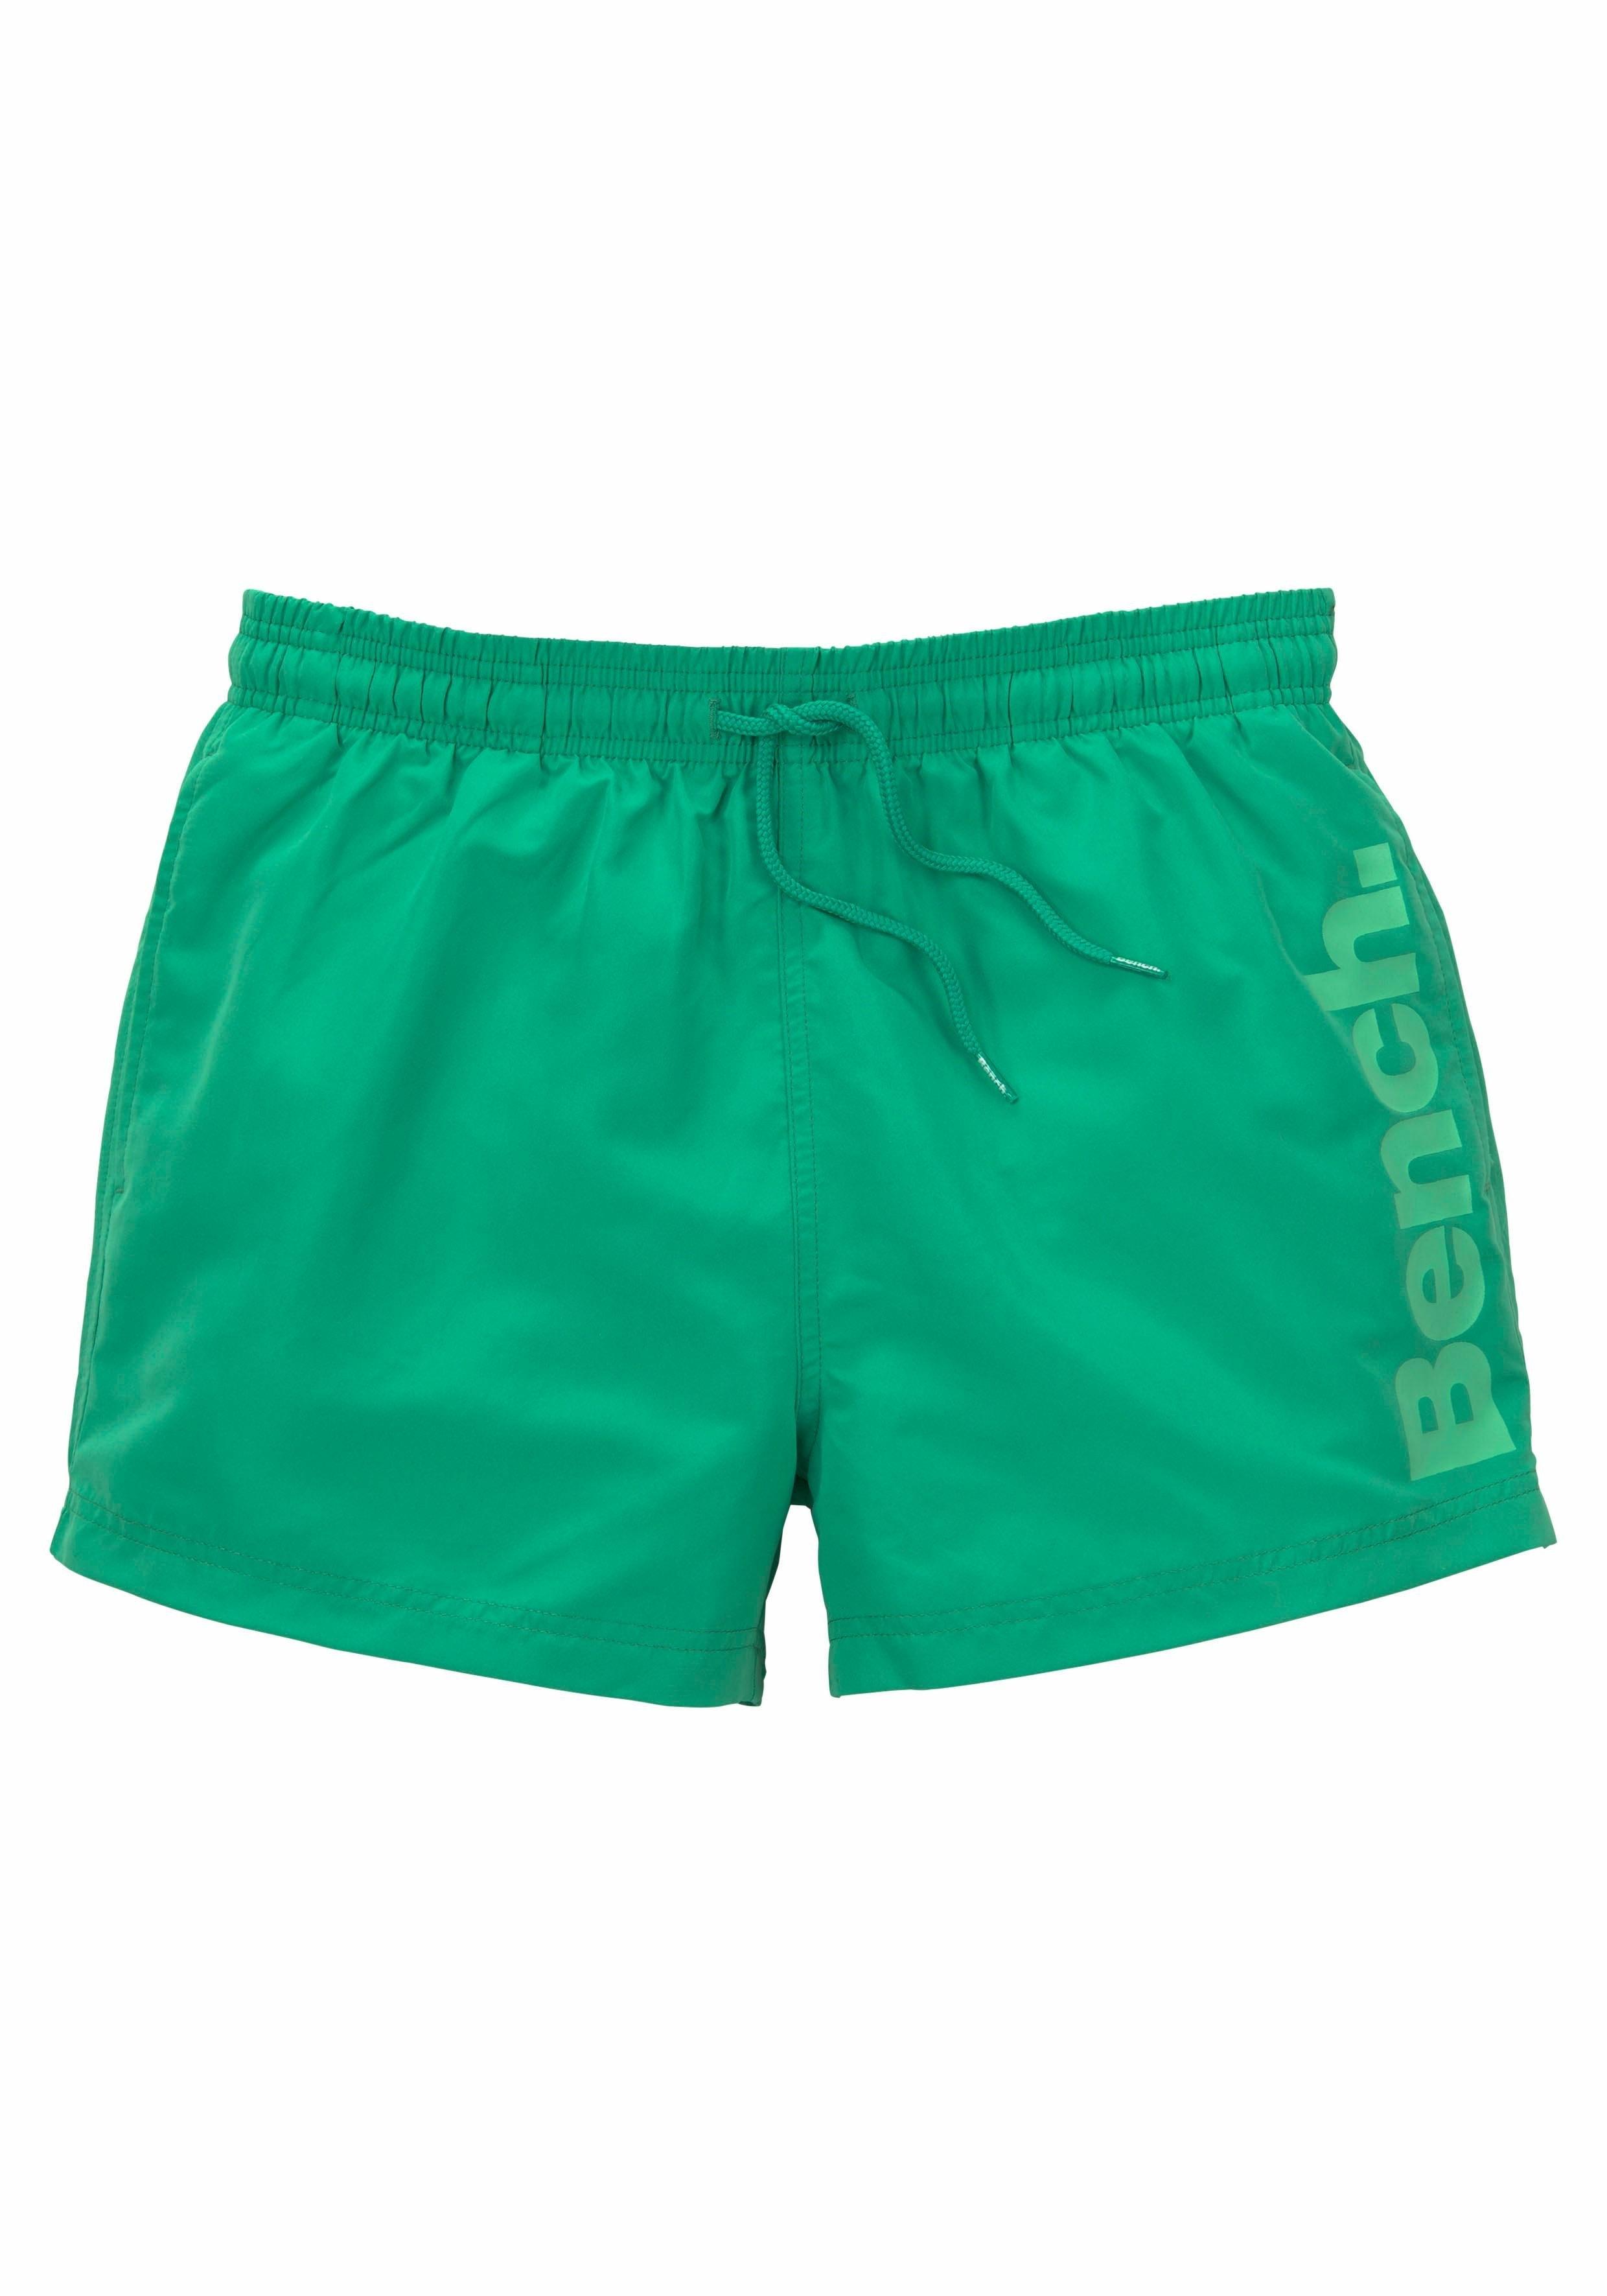 Bench. Zwemshort online kopen op lascana.nl